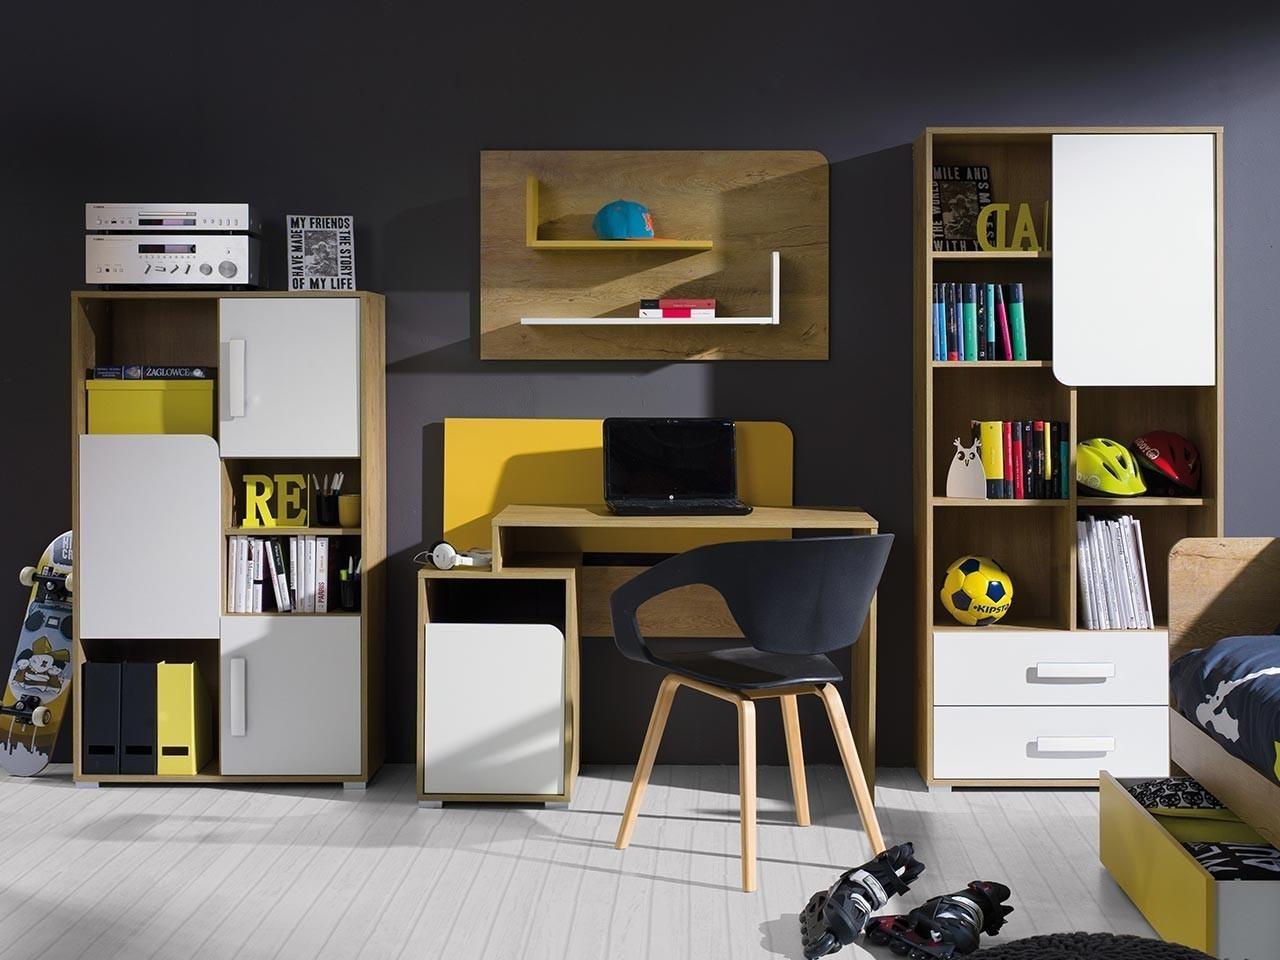 Kinderzimmer-Set Wruno VI - x-moebel24